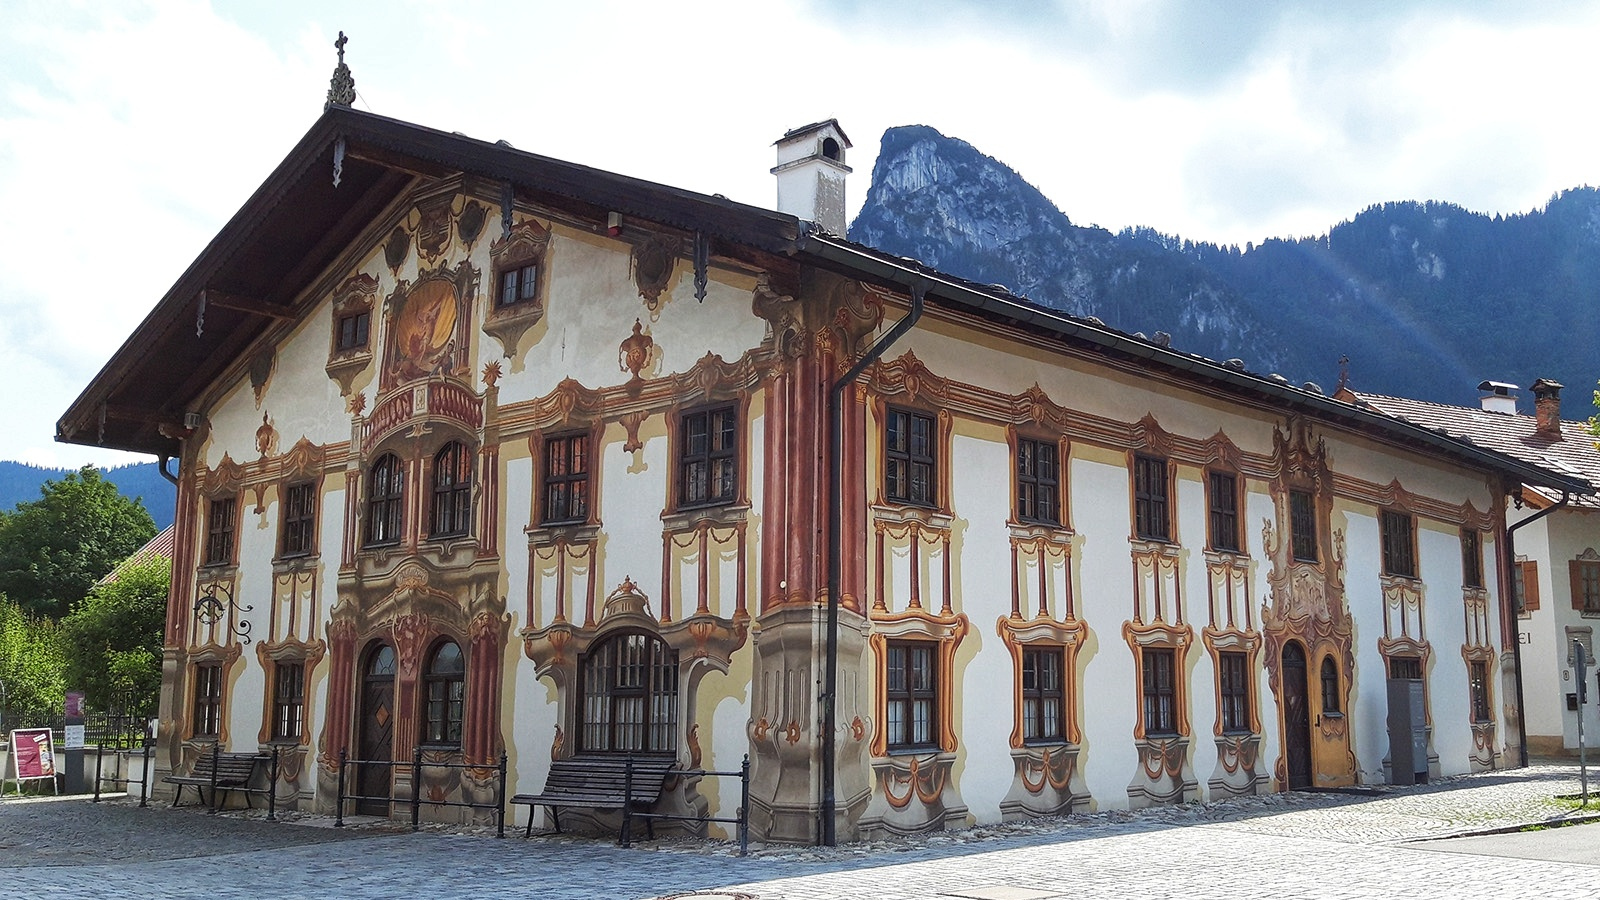 Üppig bemaltes Haus in Oberammergau